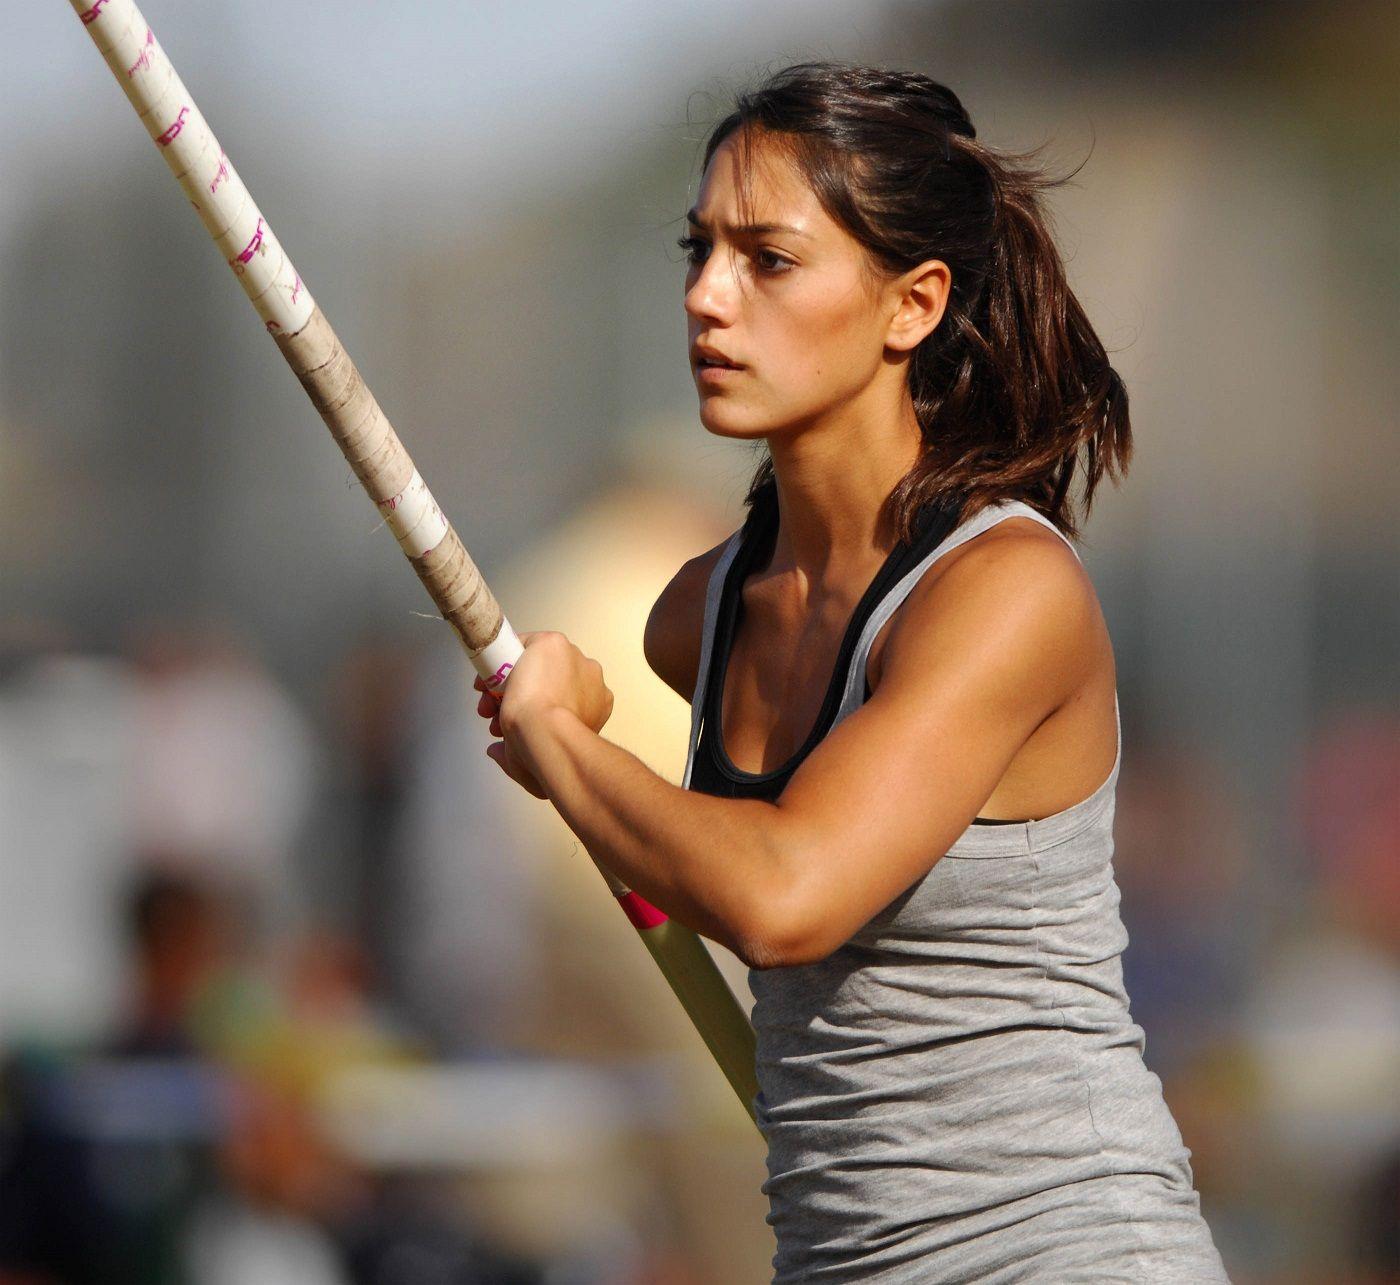 Gorgeous Pole Vaulter Allison Stokke Pose for Athleta - Page 5